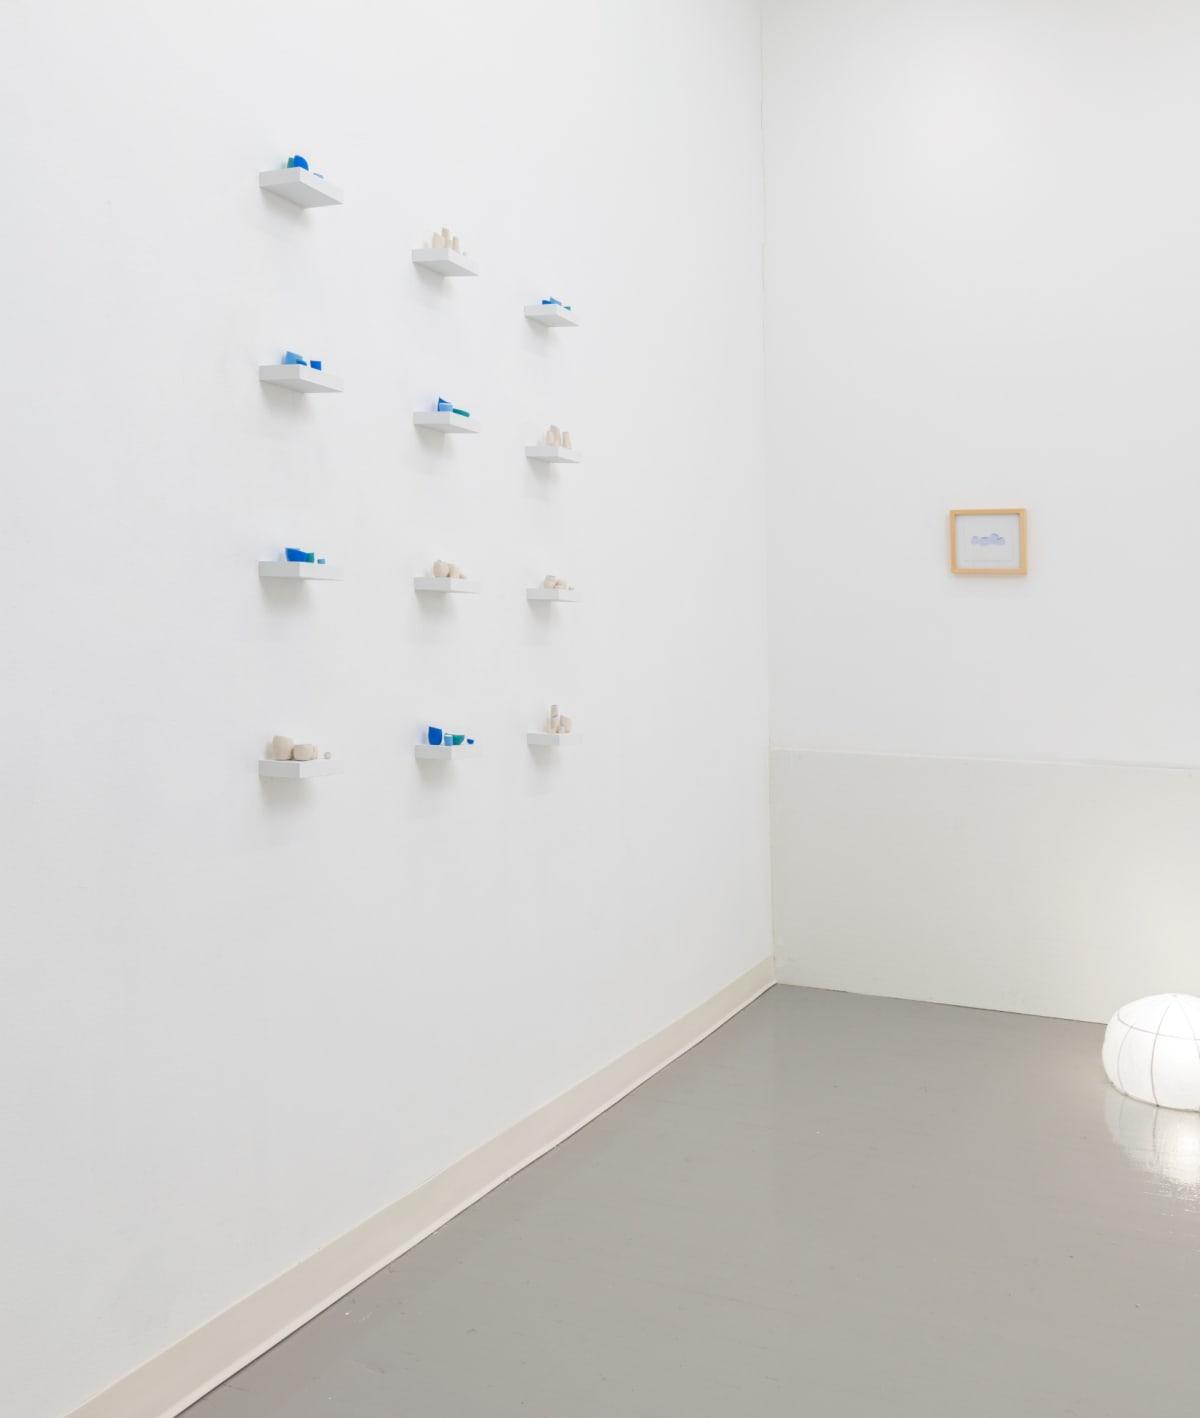 "Exhibition Review: Leah Harper's ""Mitosis"" A Triumph, AUDRA LAMBERT, ANTE MAG"